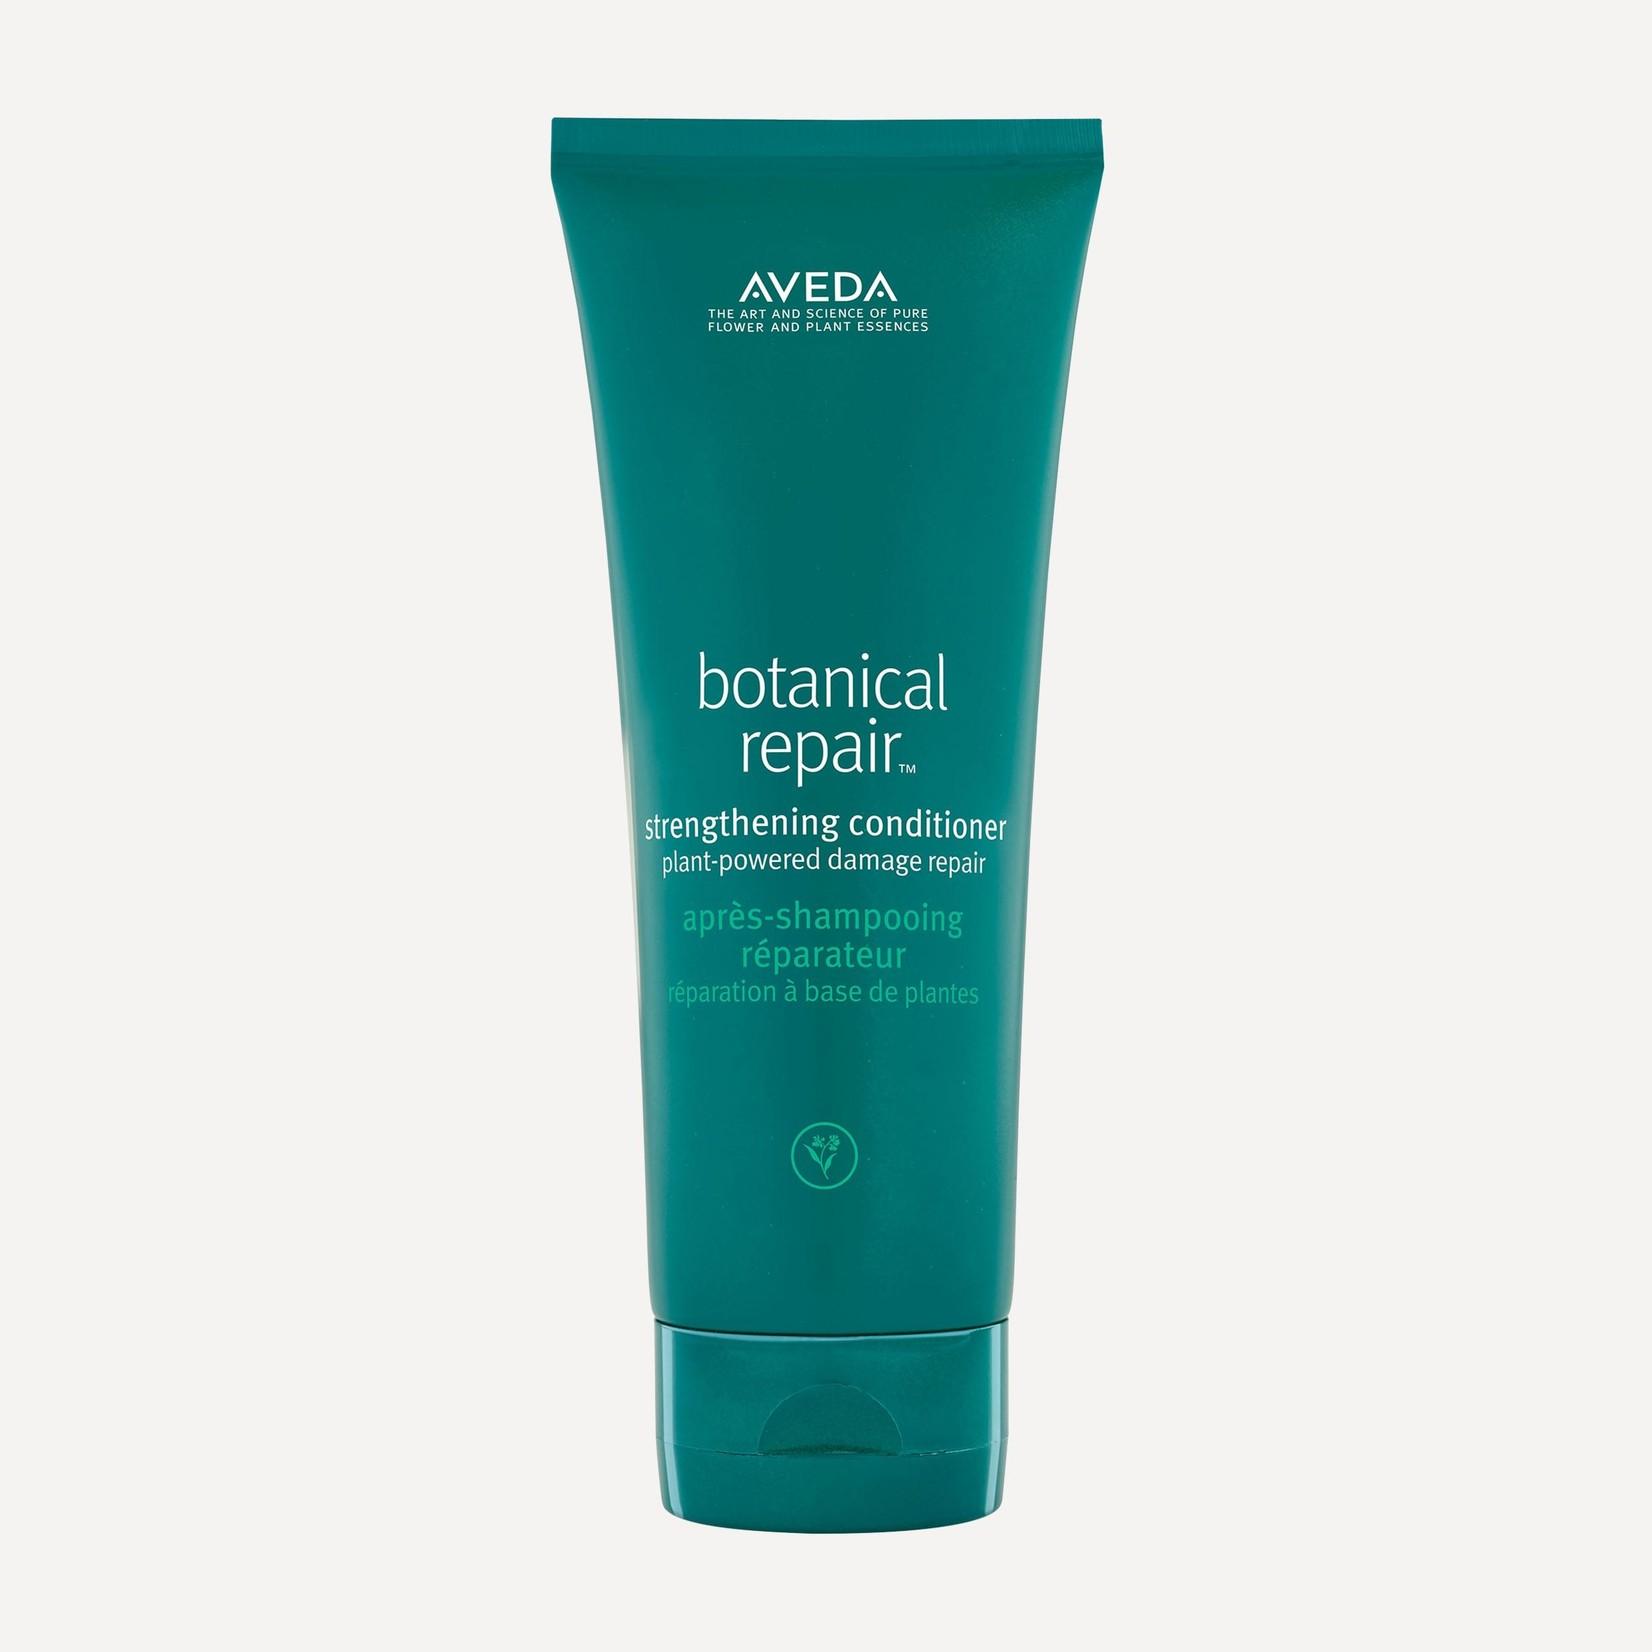 AVEDA Botanical Repair™ Strengthening Conditioner